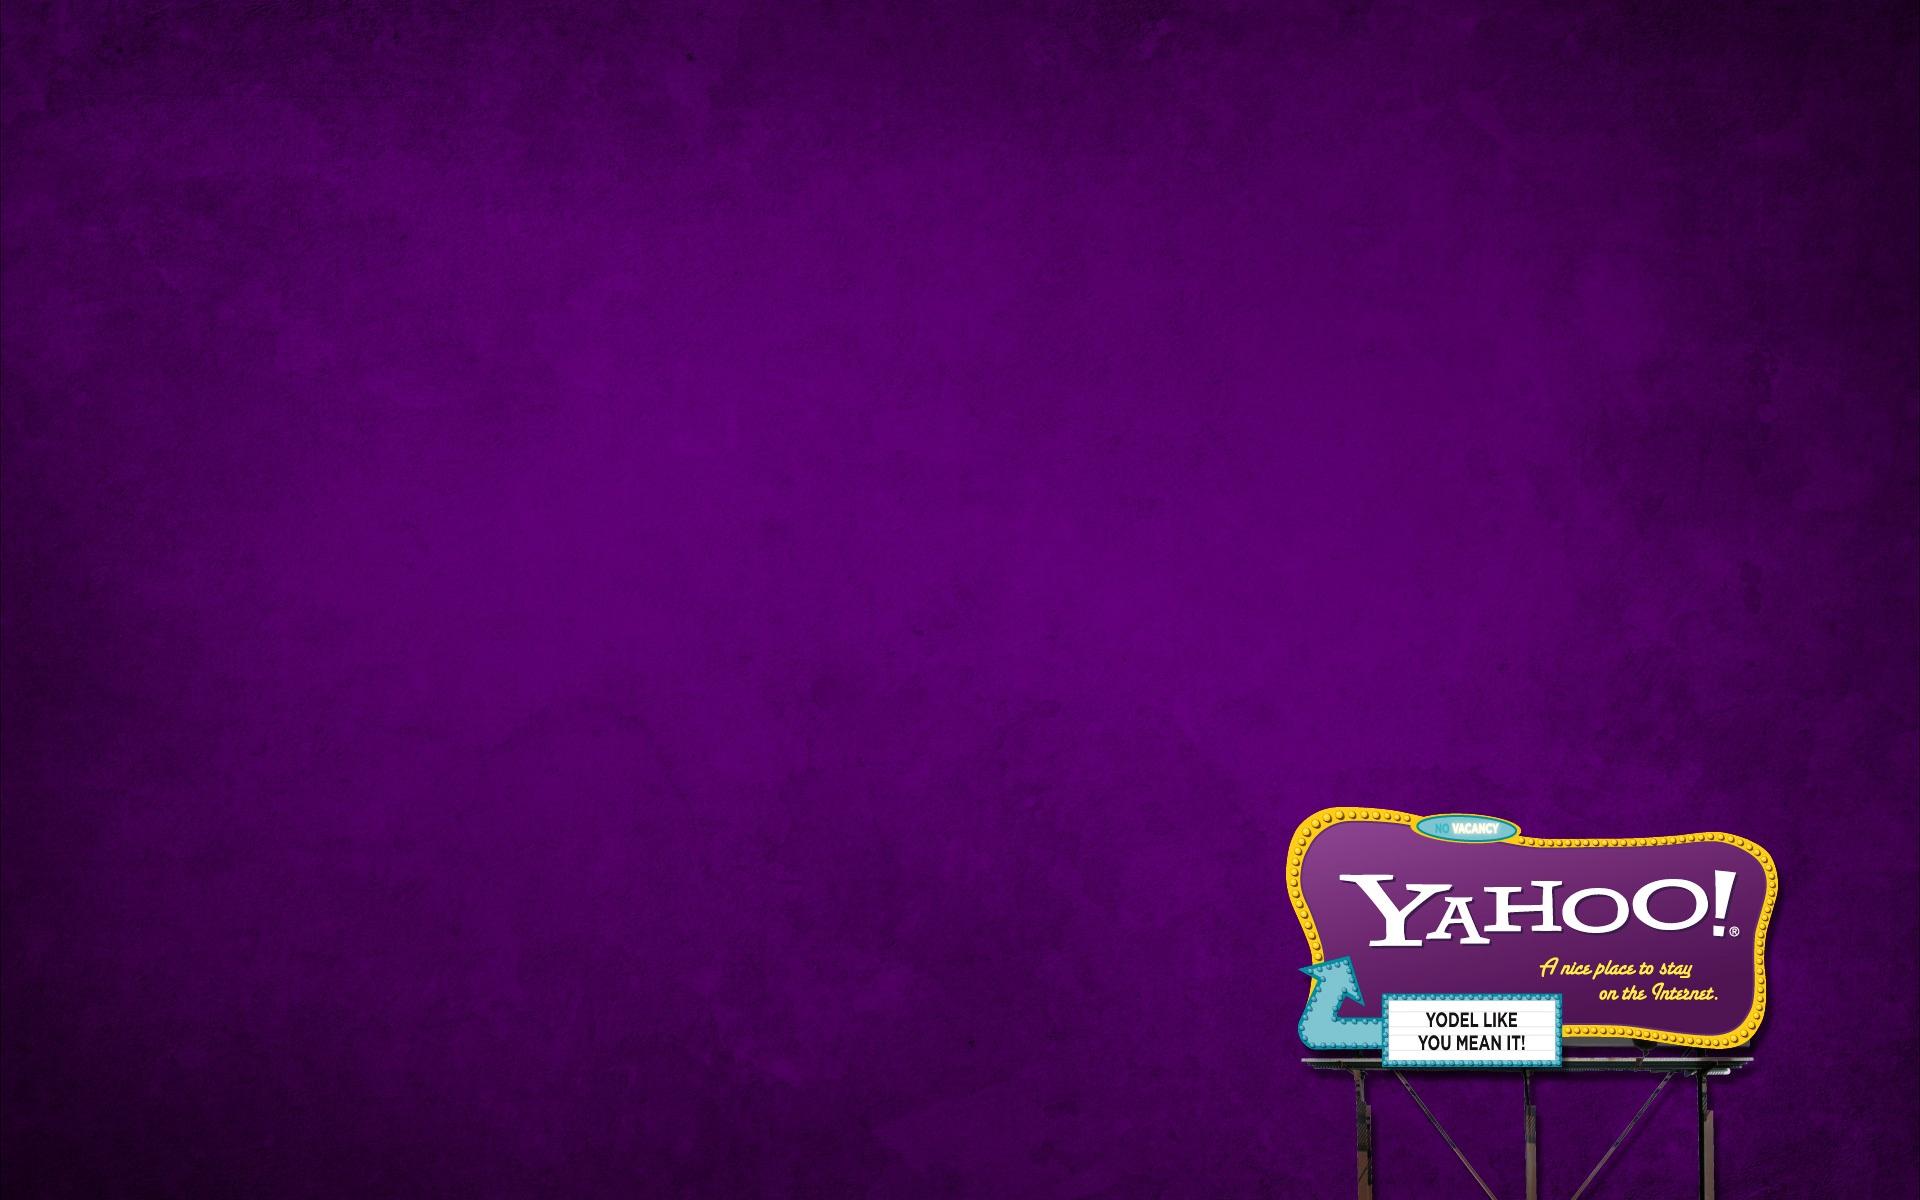 Yahoo Screensavers 1920x1200